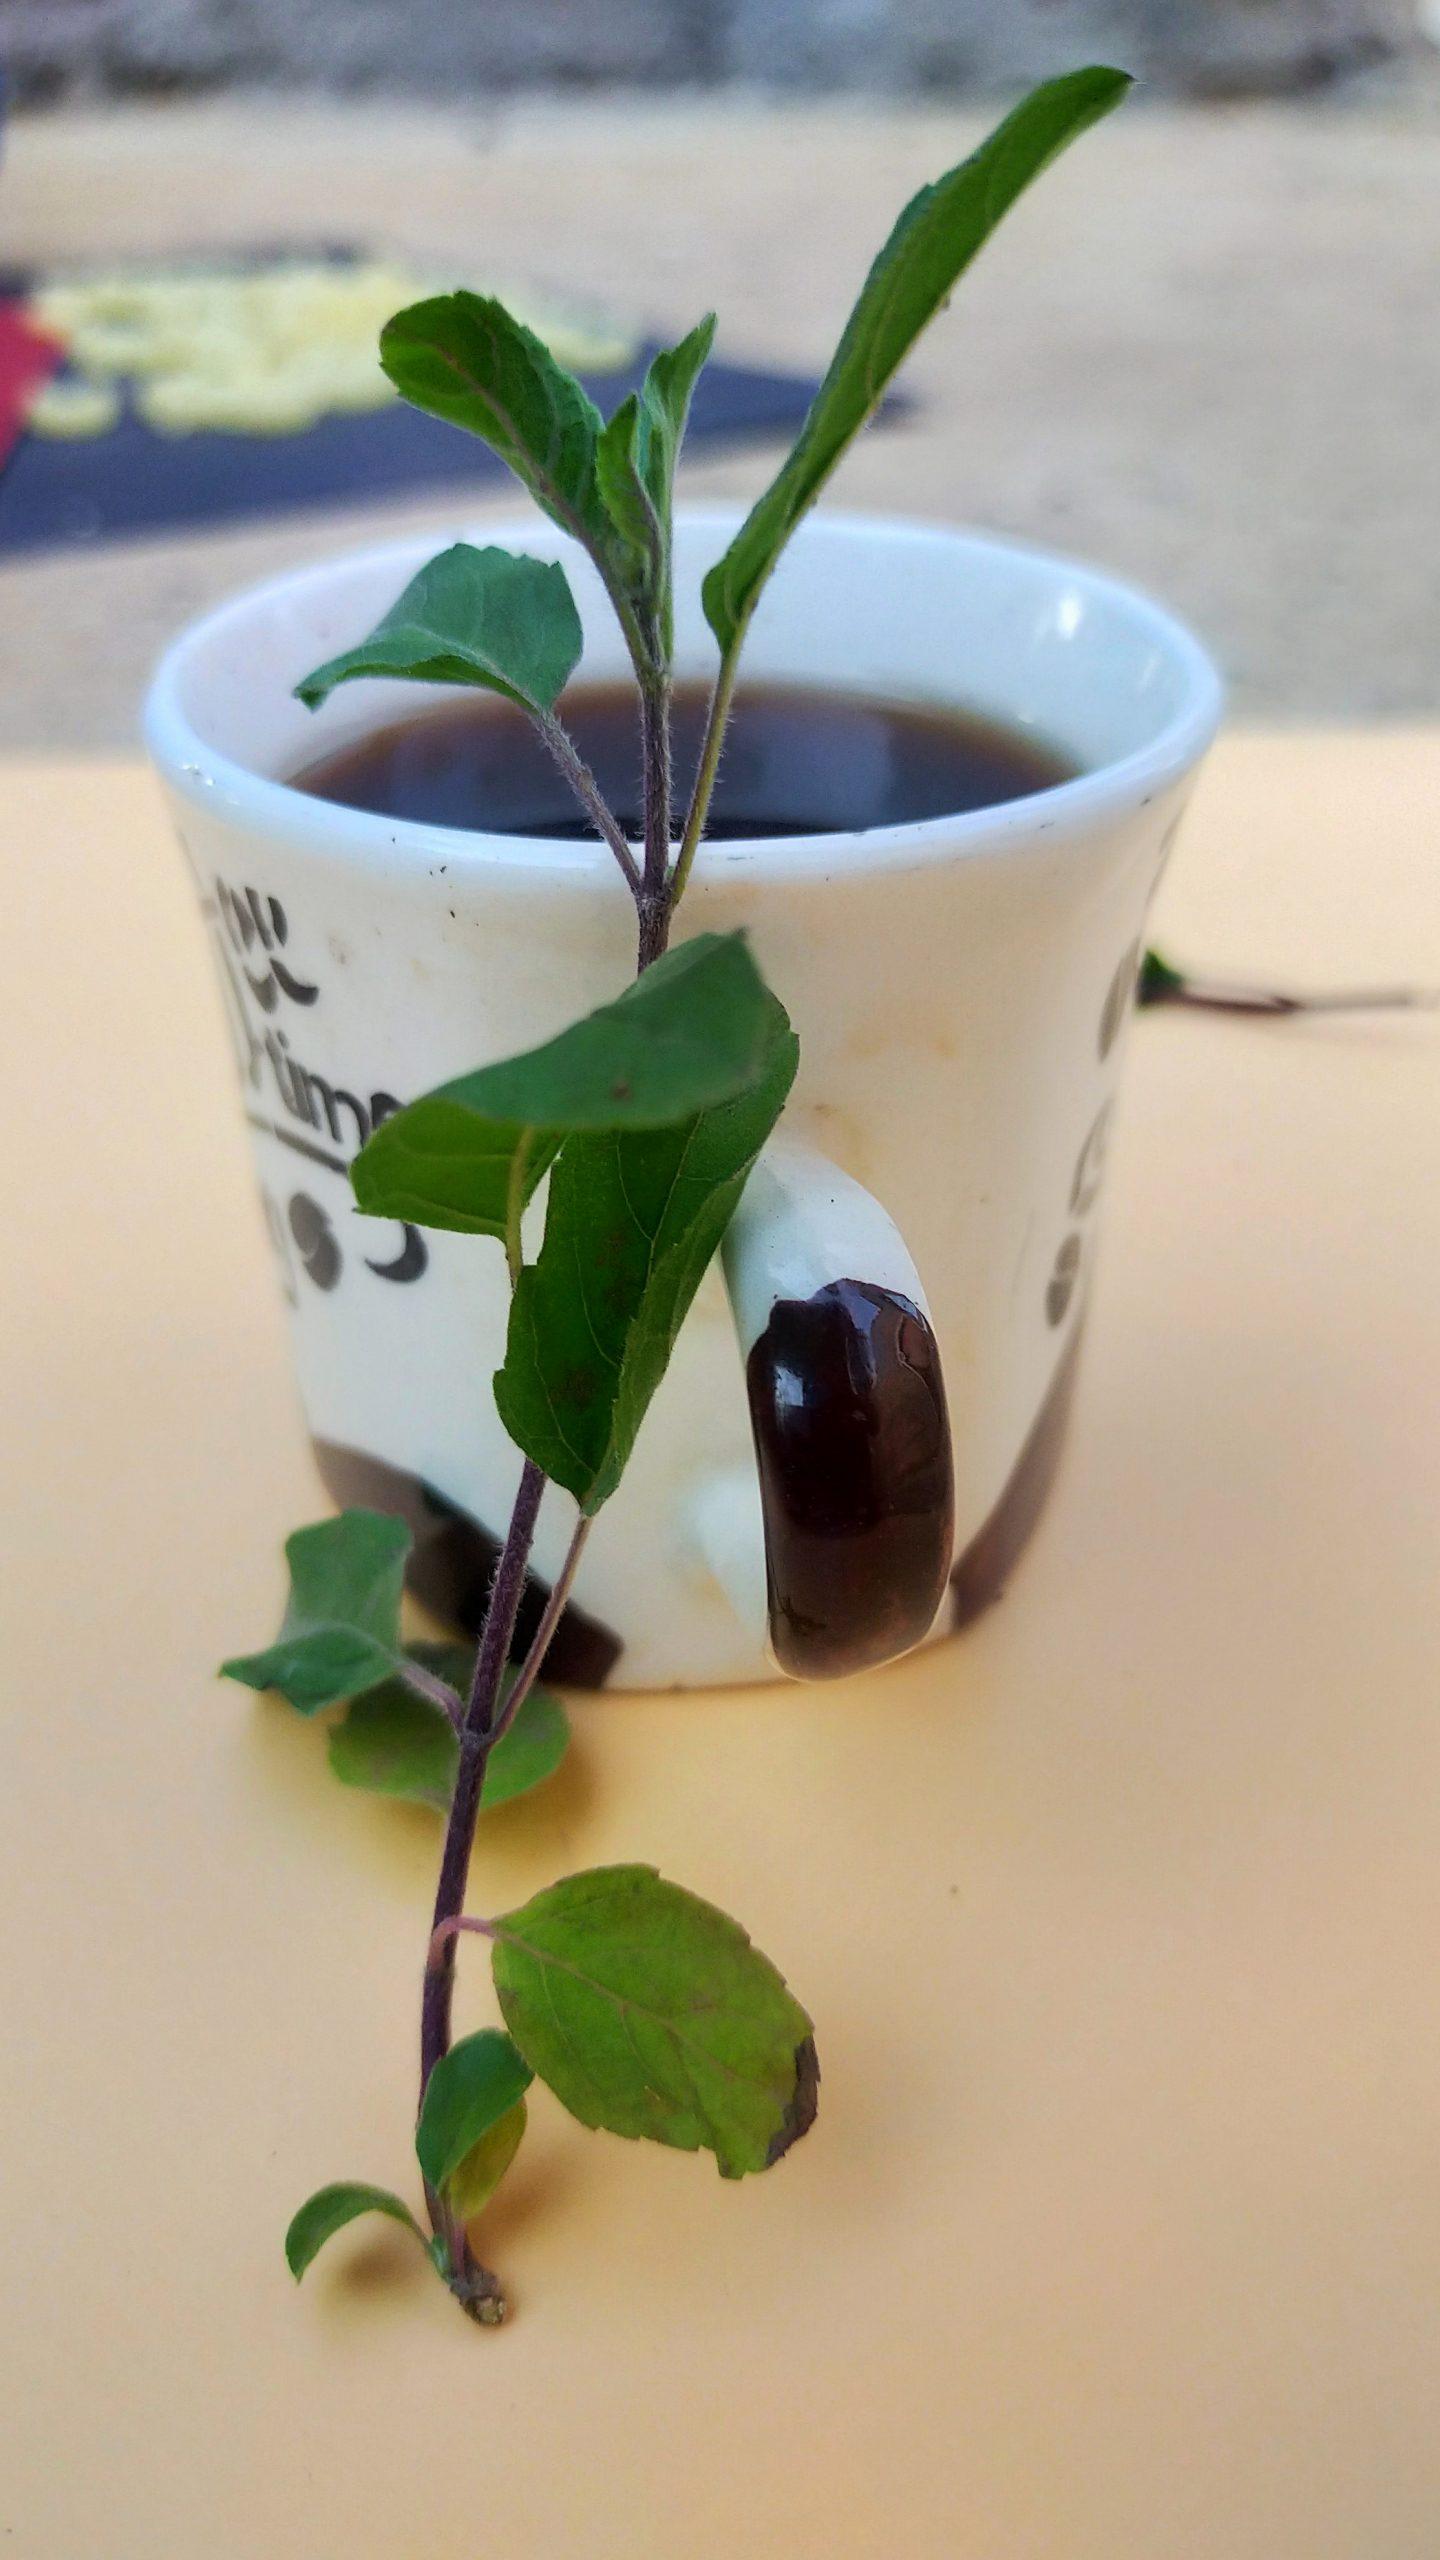 A herbal tea cup